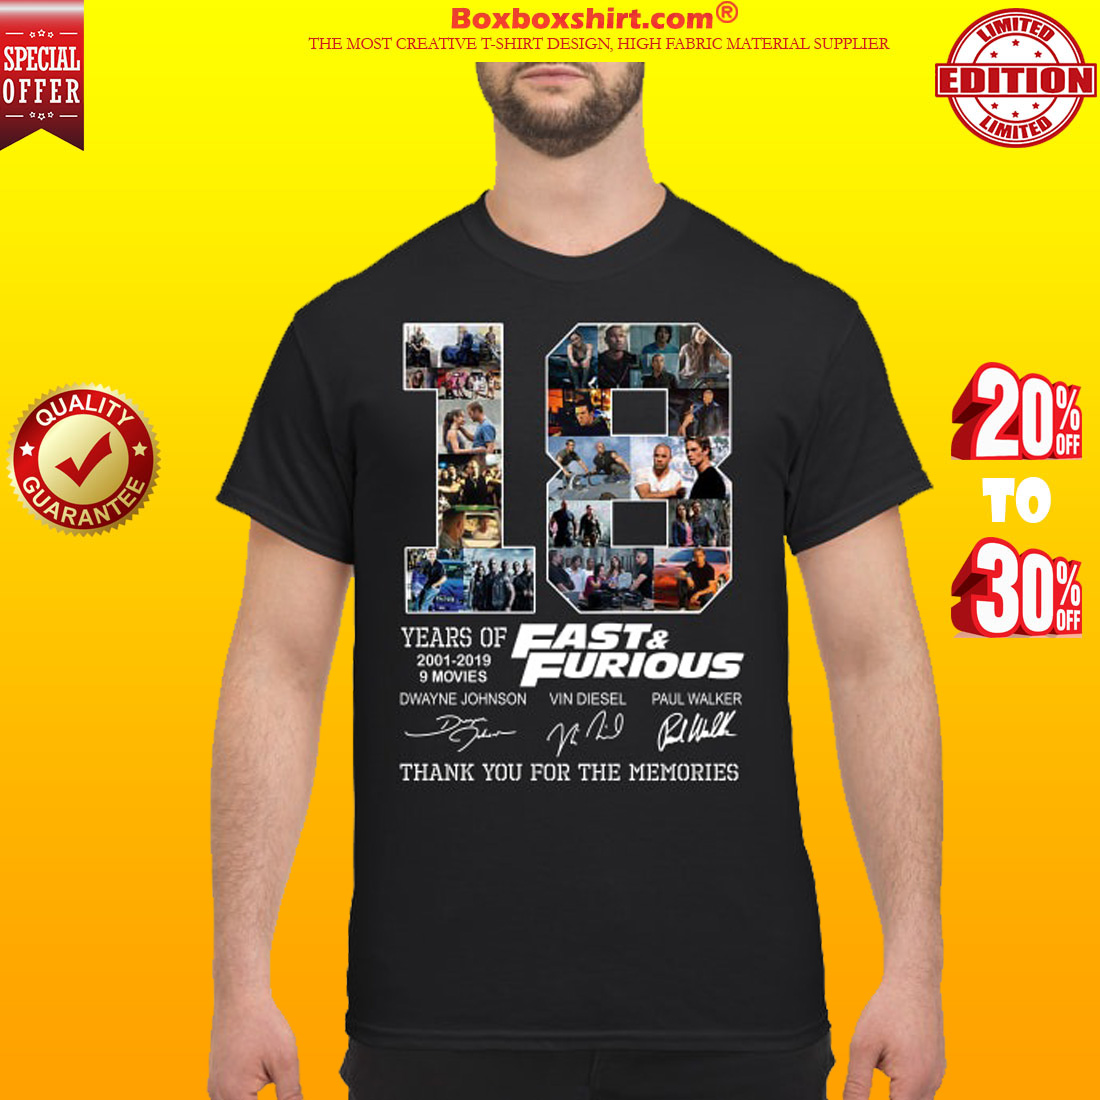 18 years of fast and furious Dwayne Johnson Vin diesel Paul Walker shirt